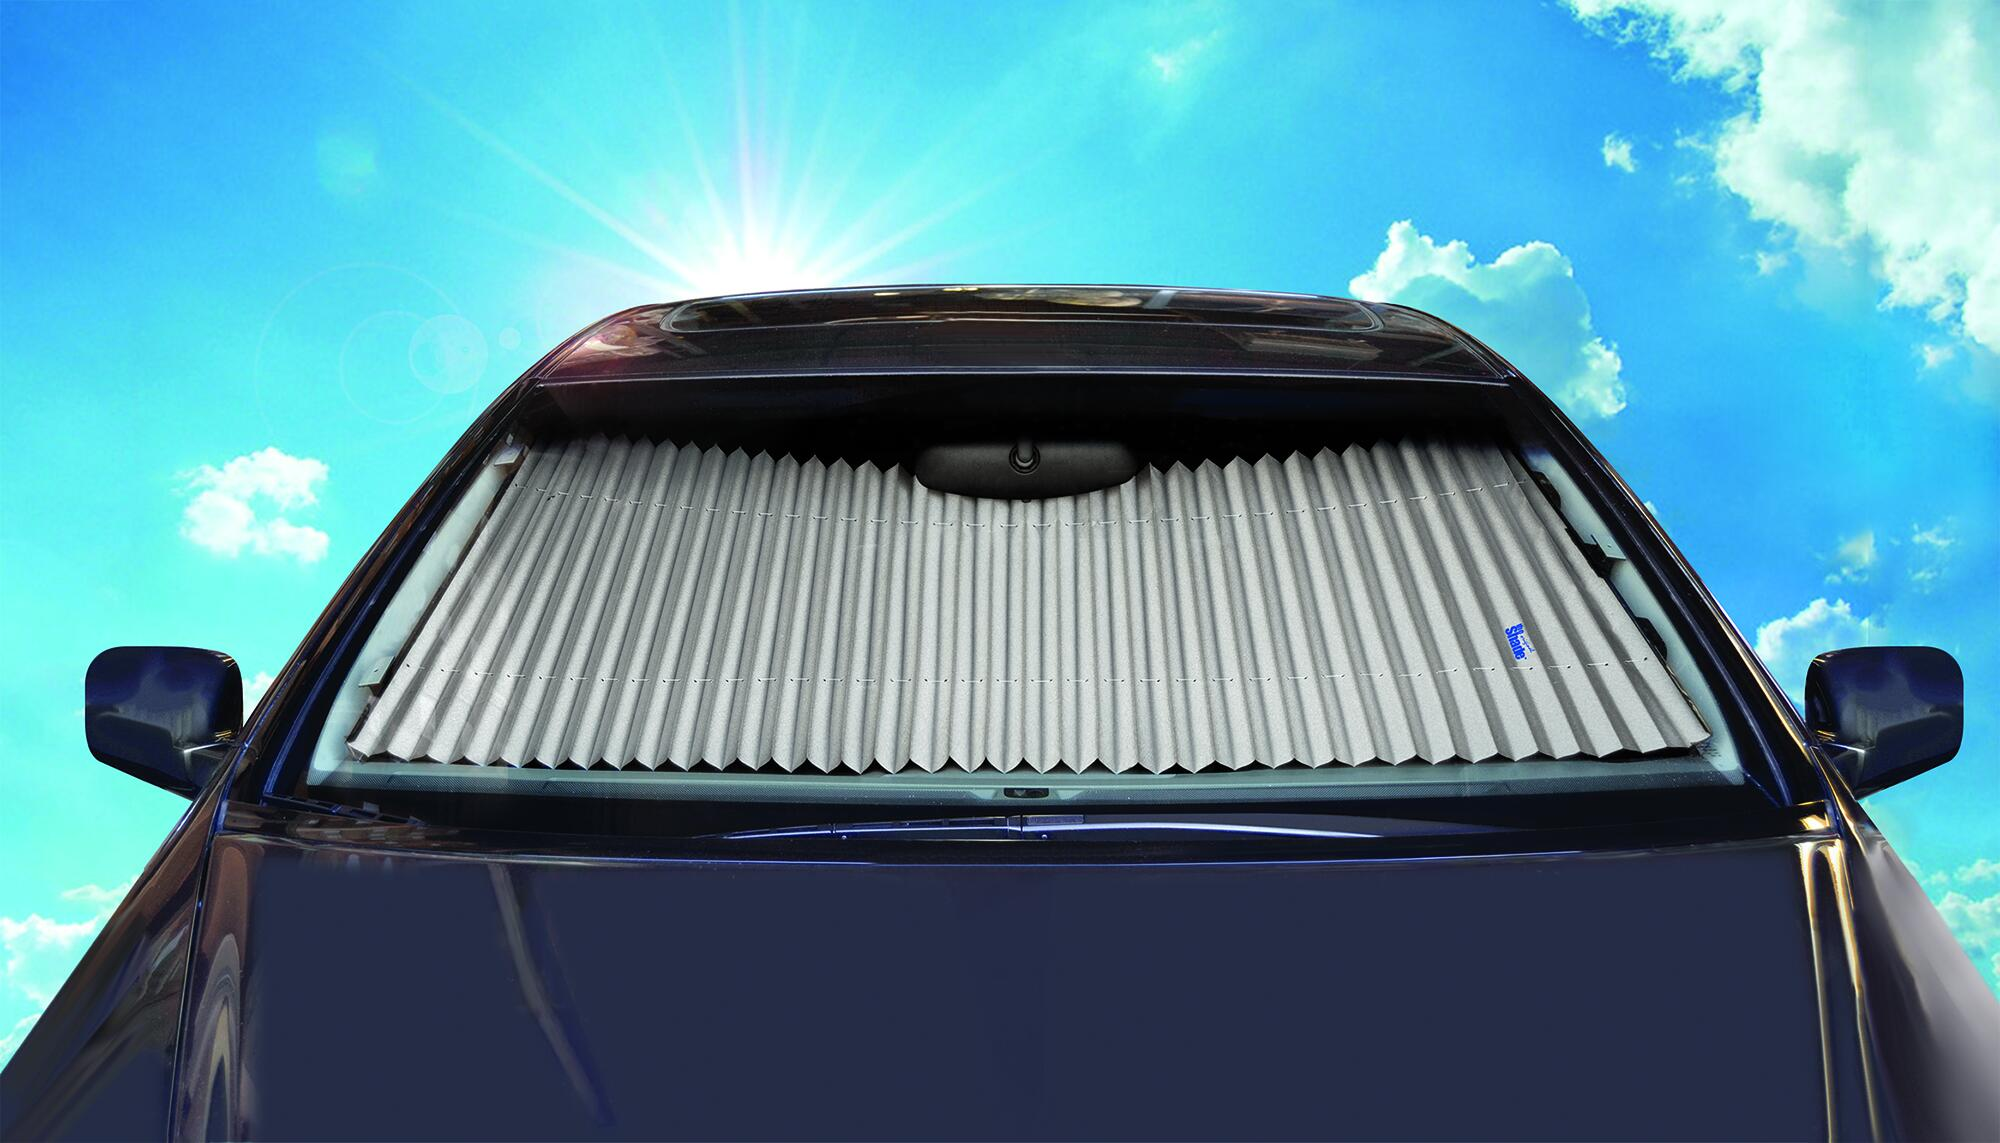 Custom Fit Retractable Winshield Sunshade for 97-04 JAGUAR XK8 - 17 Inch